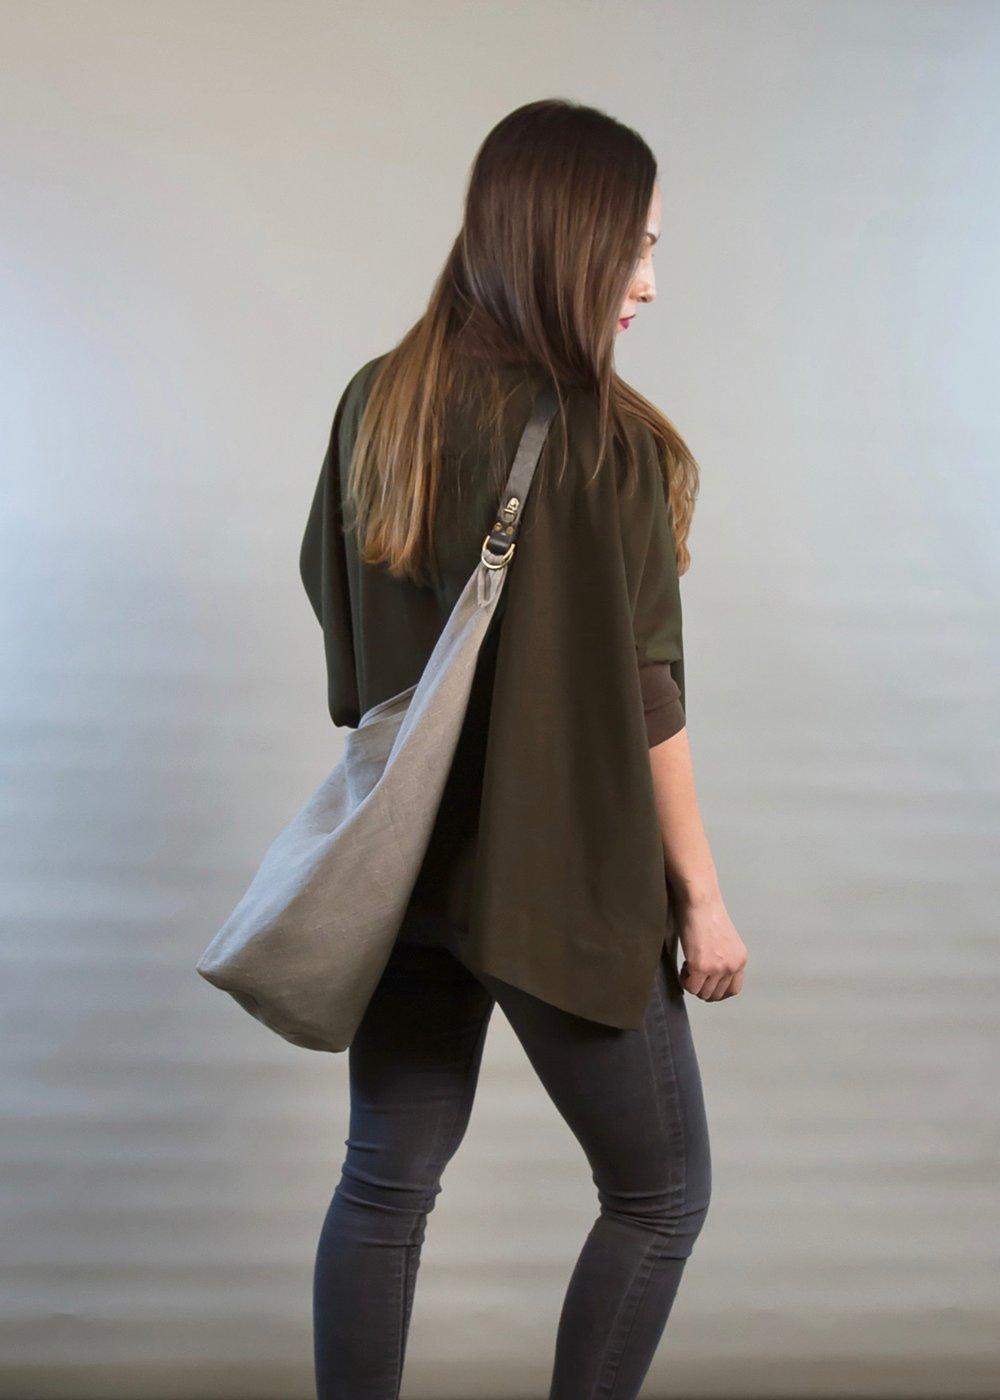 - LARGE LINEN BAG IN NATURAL W/ ORIGINAL HANDLE IN BLACK